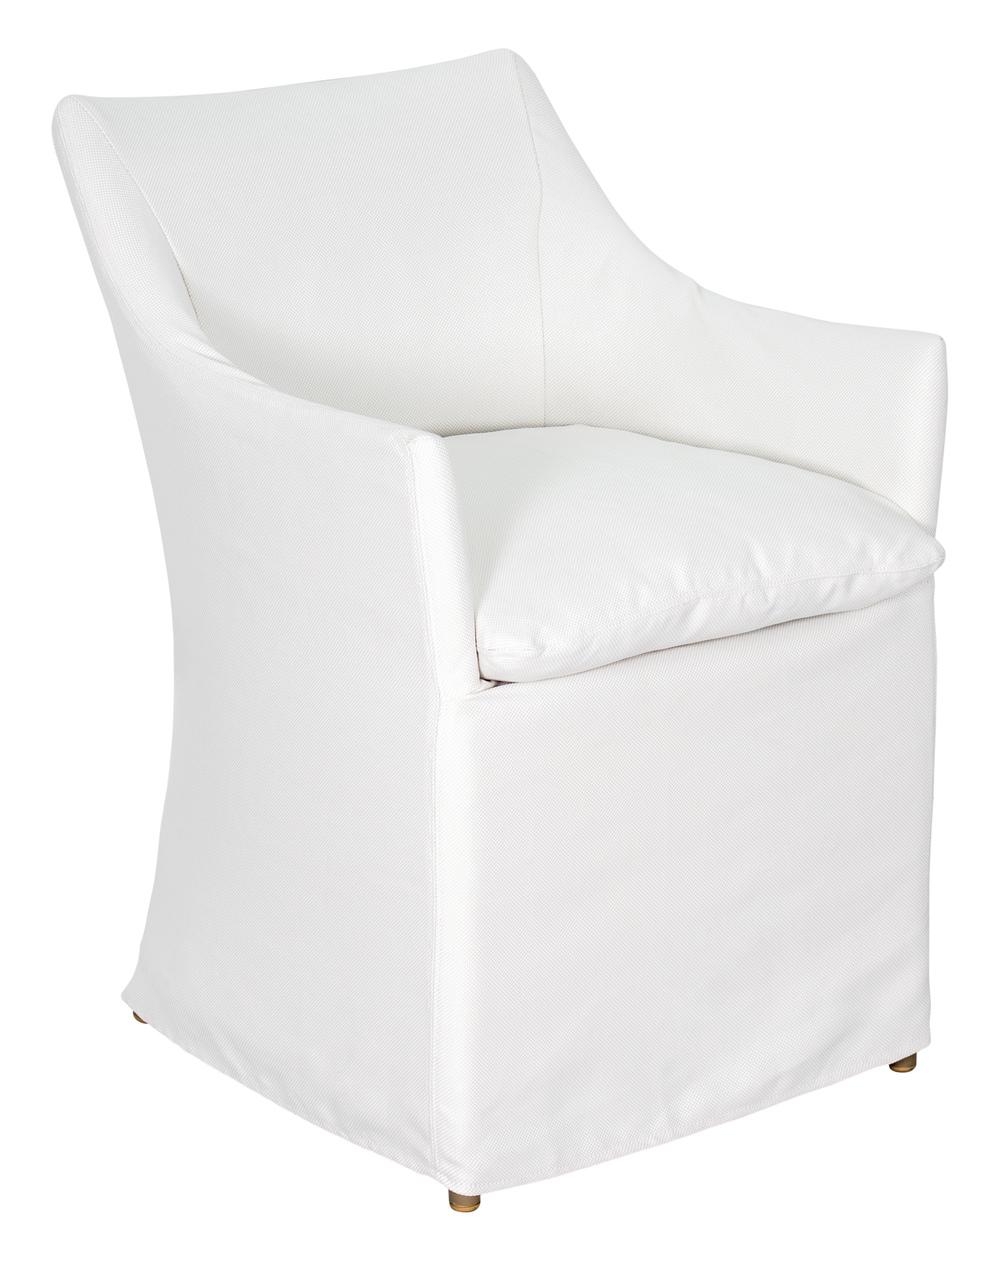 Seasonal Living - Capri Dining Chair w/ Slipcovers, Set/2